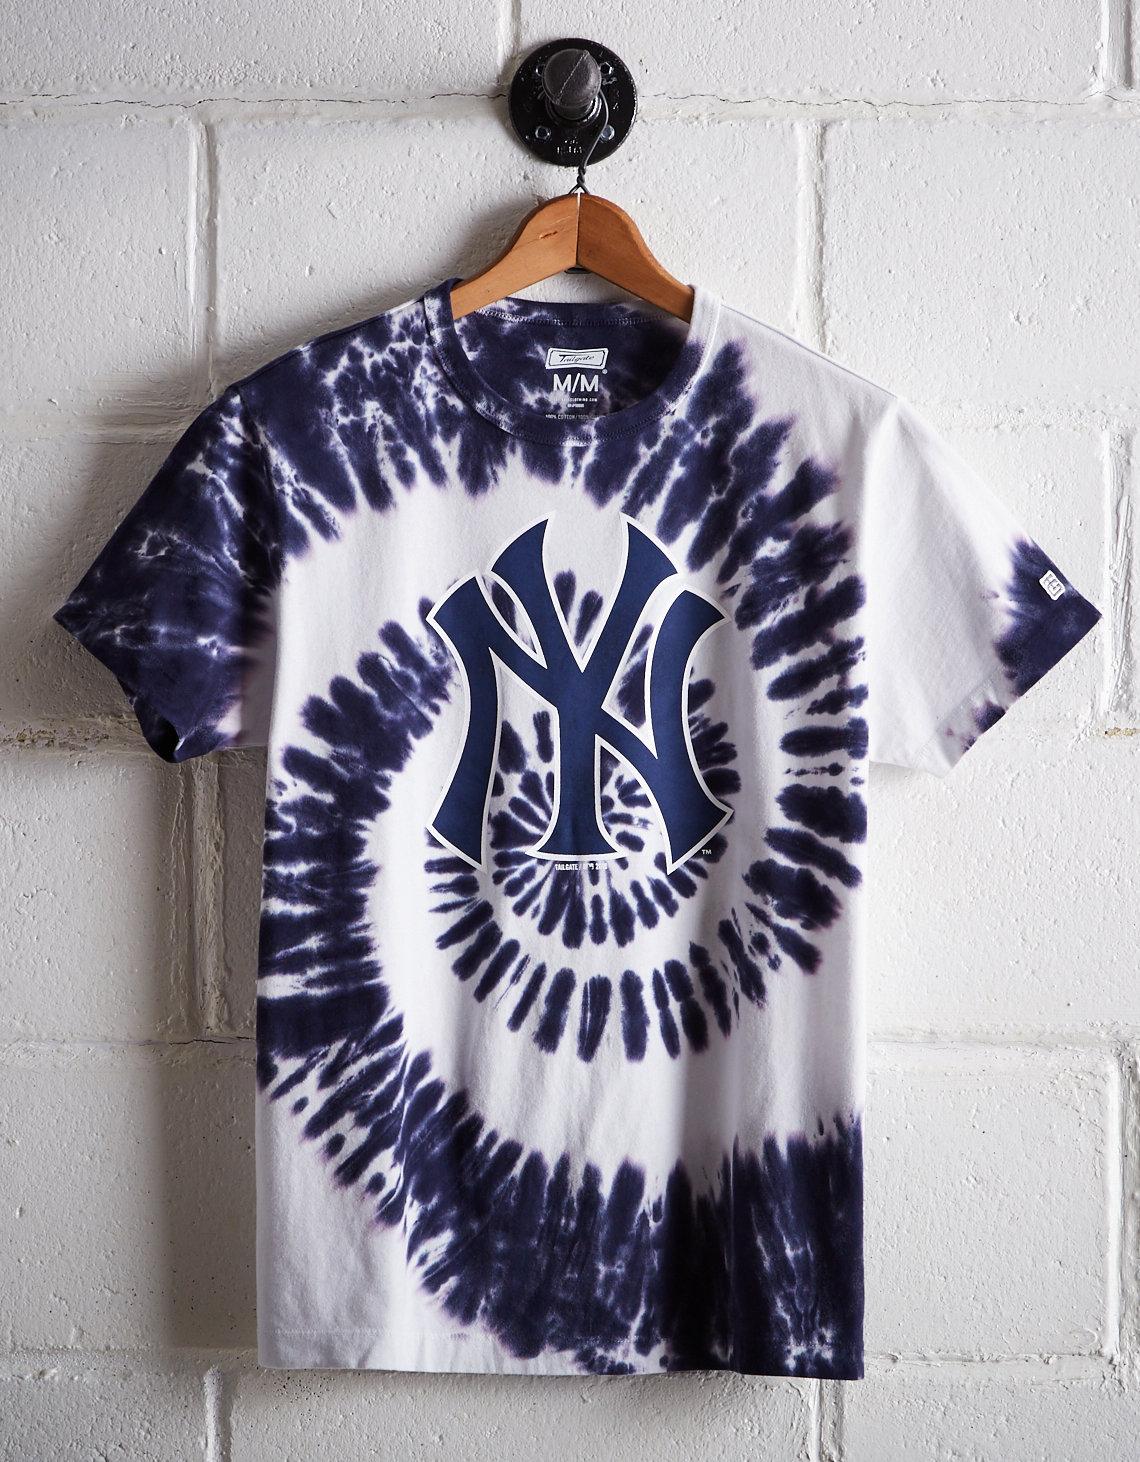 Tailgate Men s New York Yankees Tie-Dye T-Shirt 191a8b1fa56